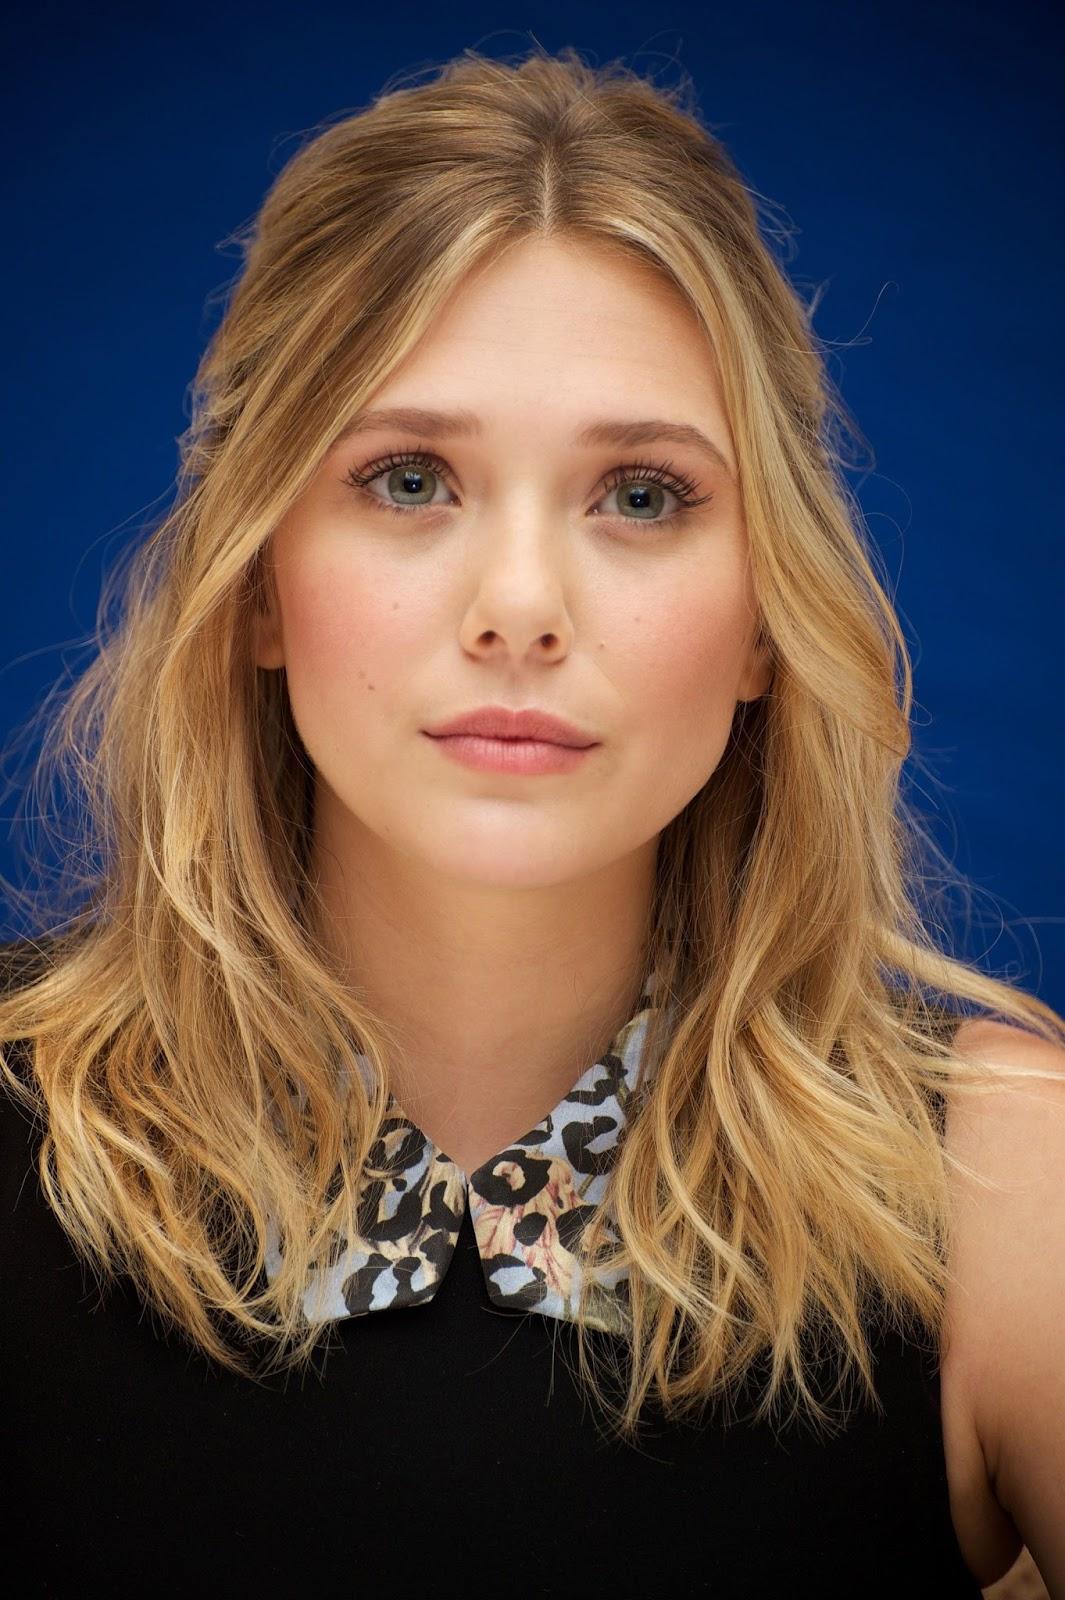 Fitness Girls Desktop Wallpapers Elizabeth Olsen Avangers Actress Hd Wallpaper Hd